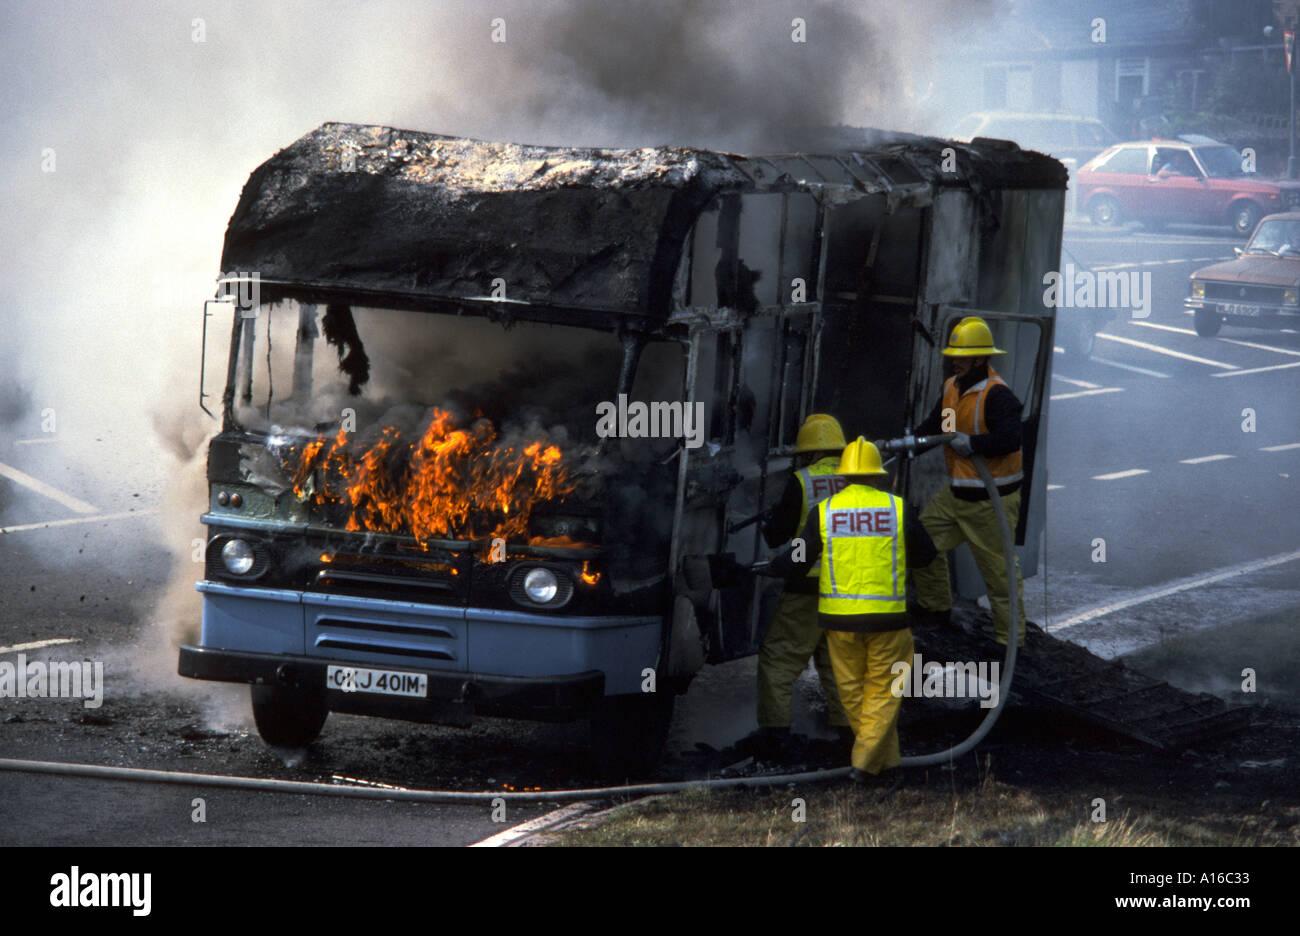 Van on fire at Hayfield, Derbyshire, England, UKStock Photo